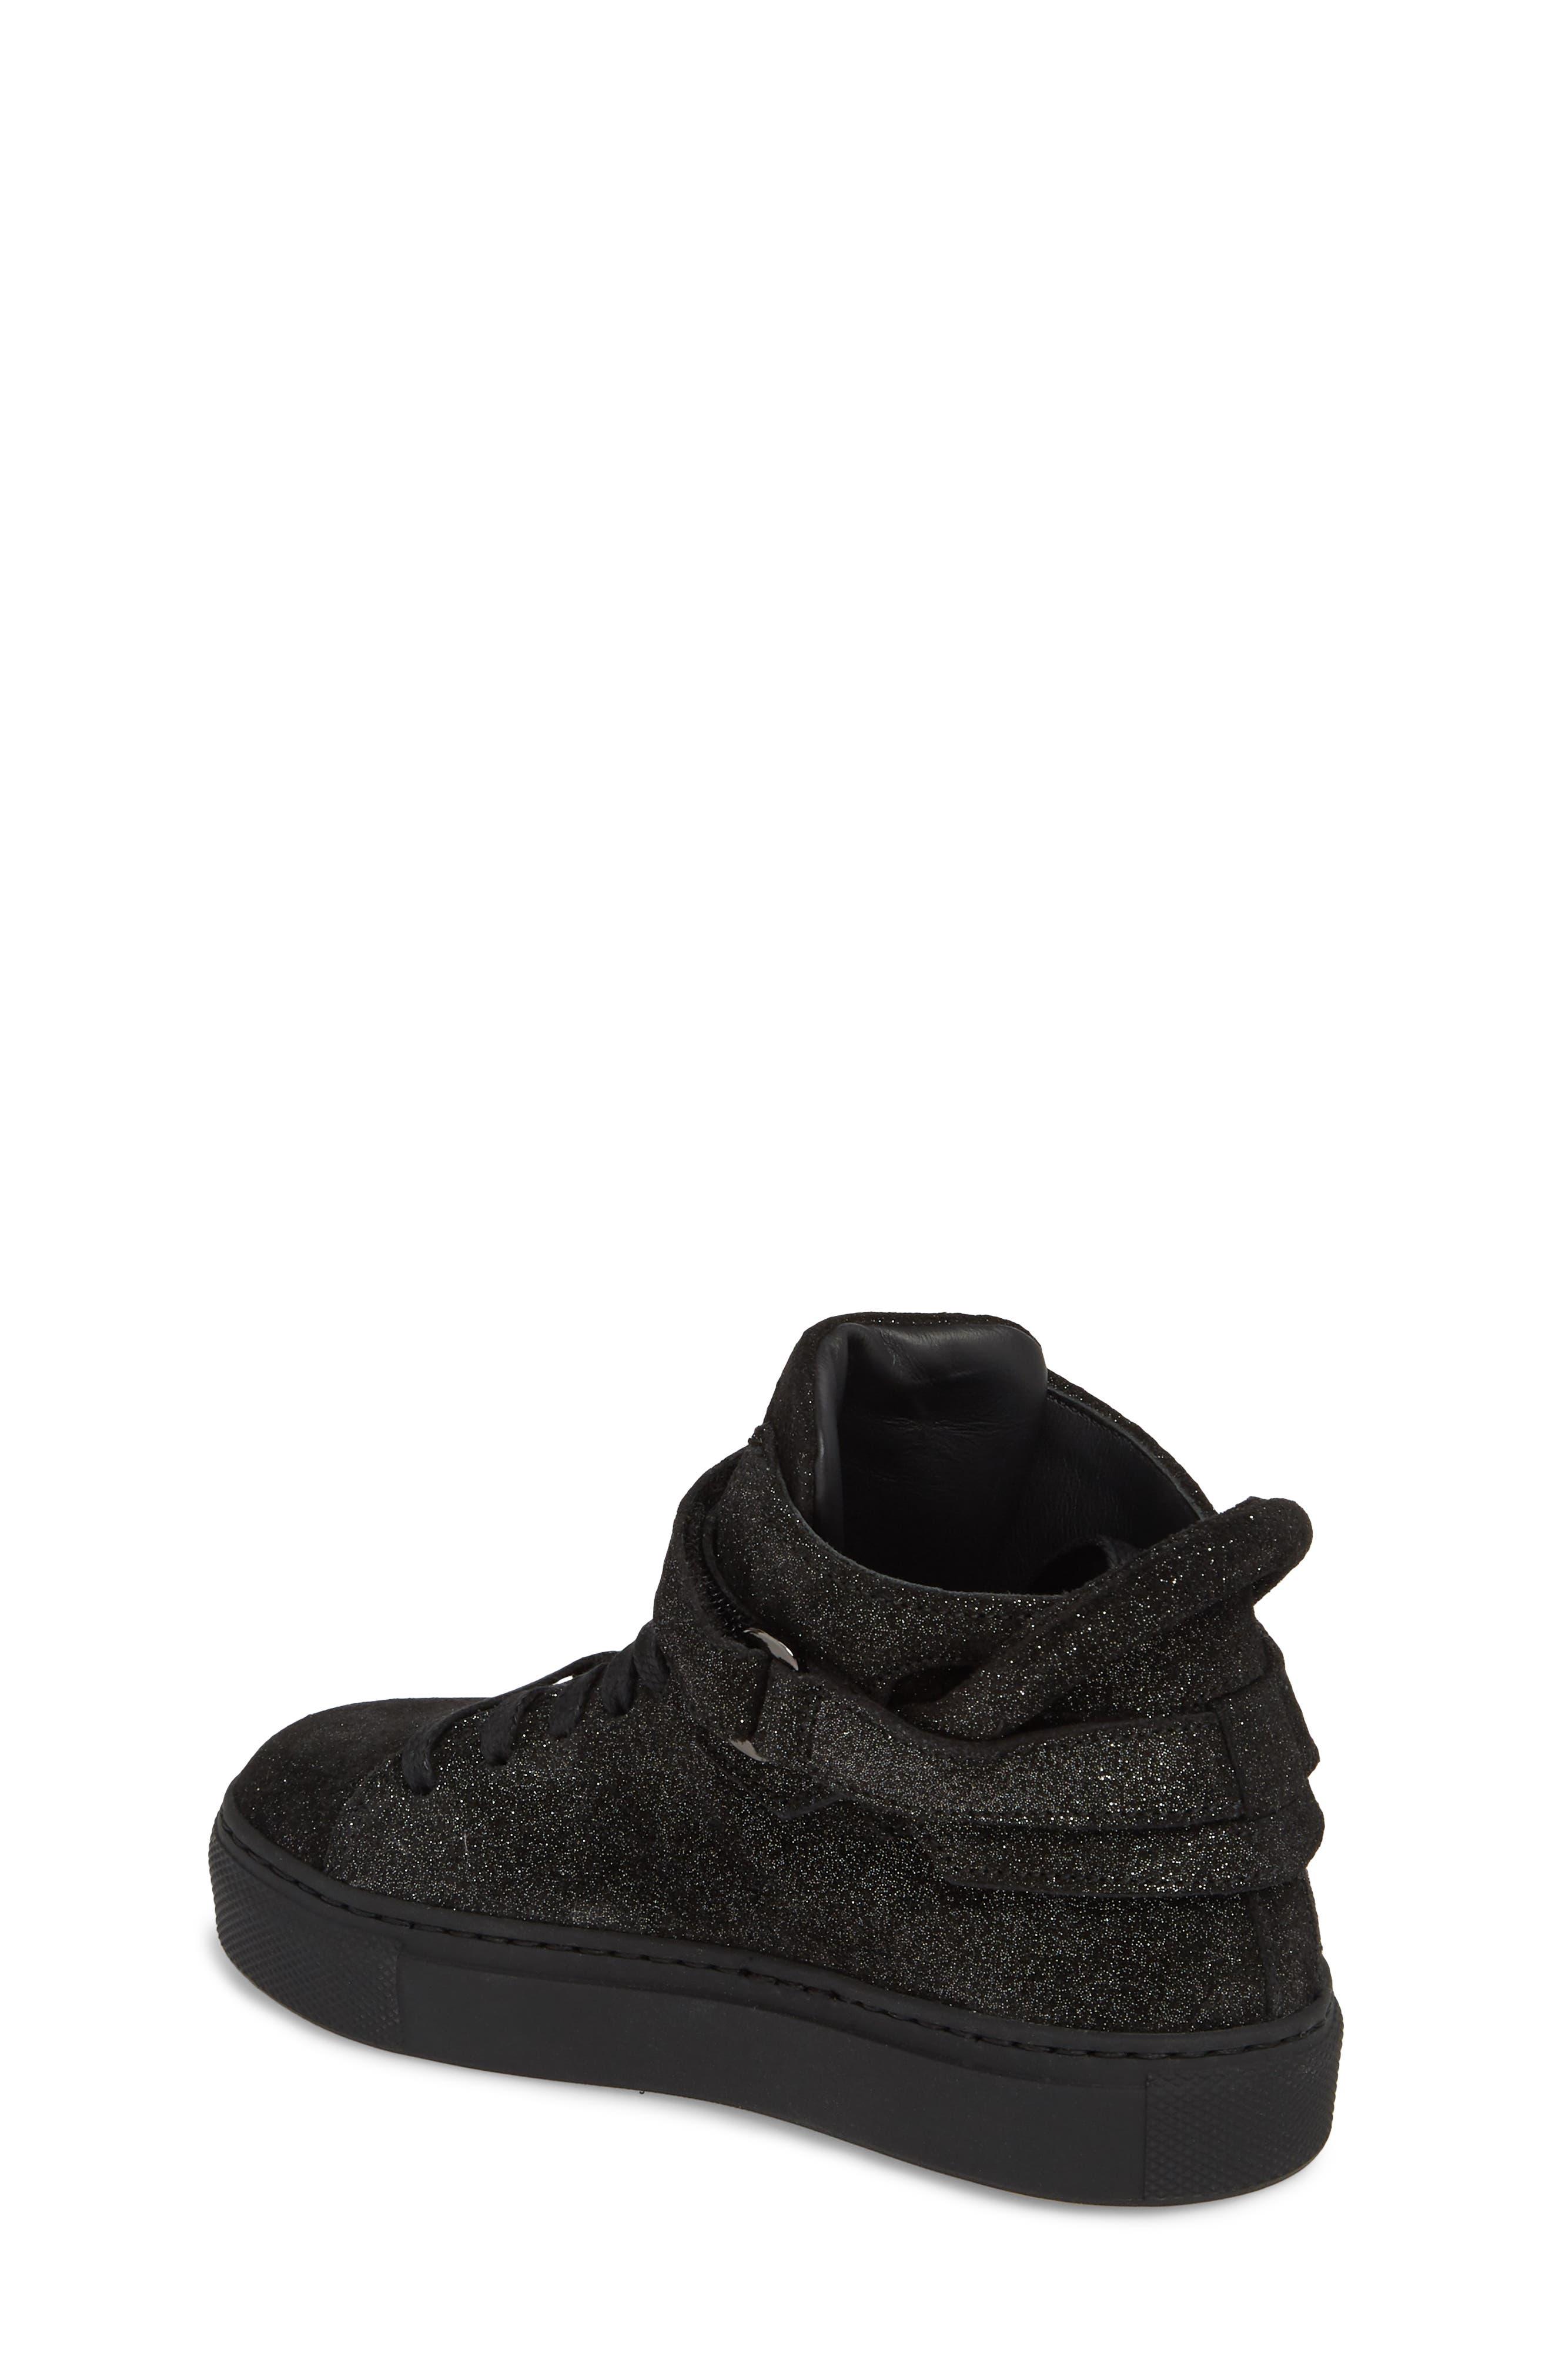 BUSCEMI,                             Gleam High Top Sneaker,                             Alternate thumbnail 2, color,                             001